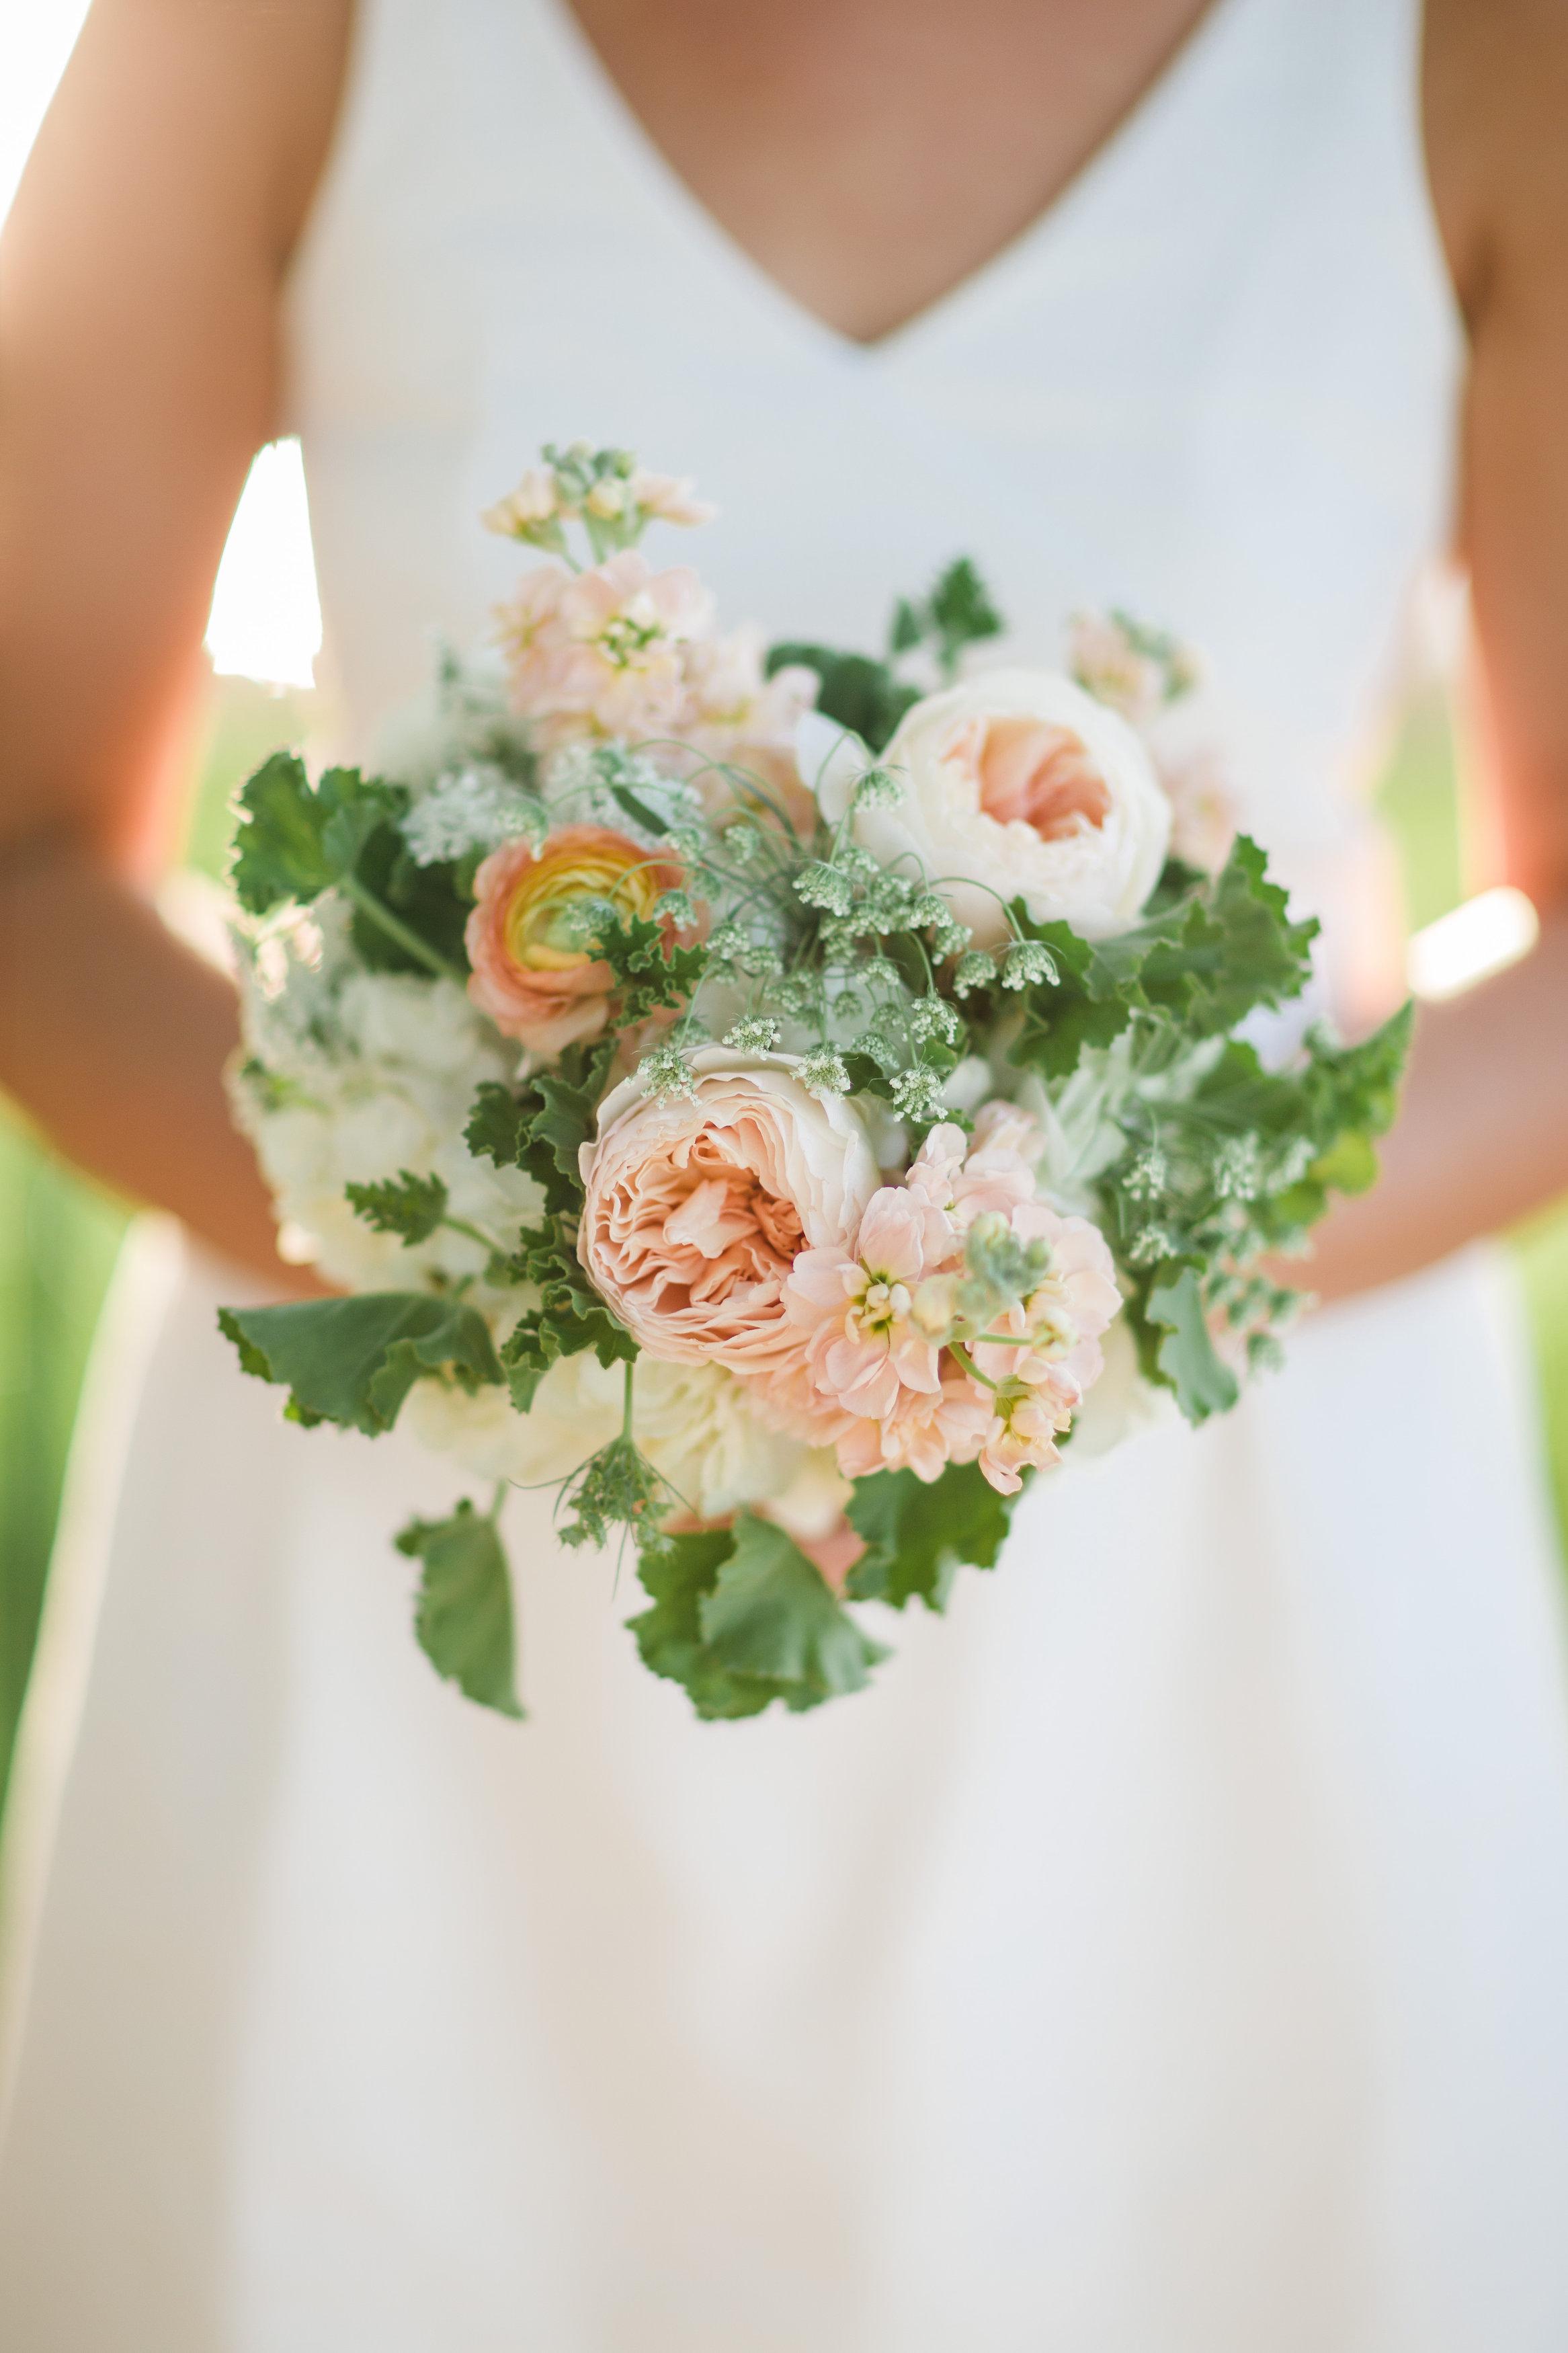 Flowers by Fleur, Photo by Amanda Crean Photography